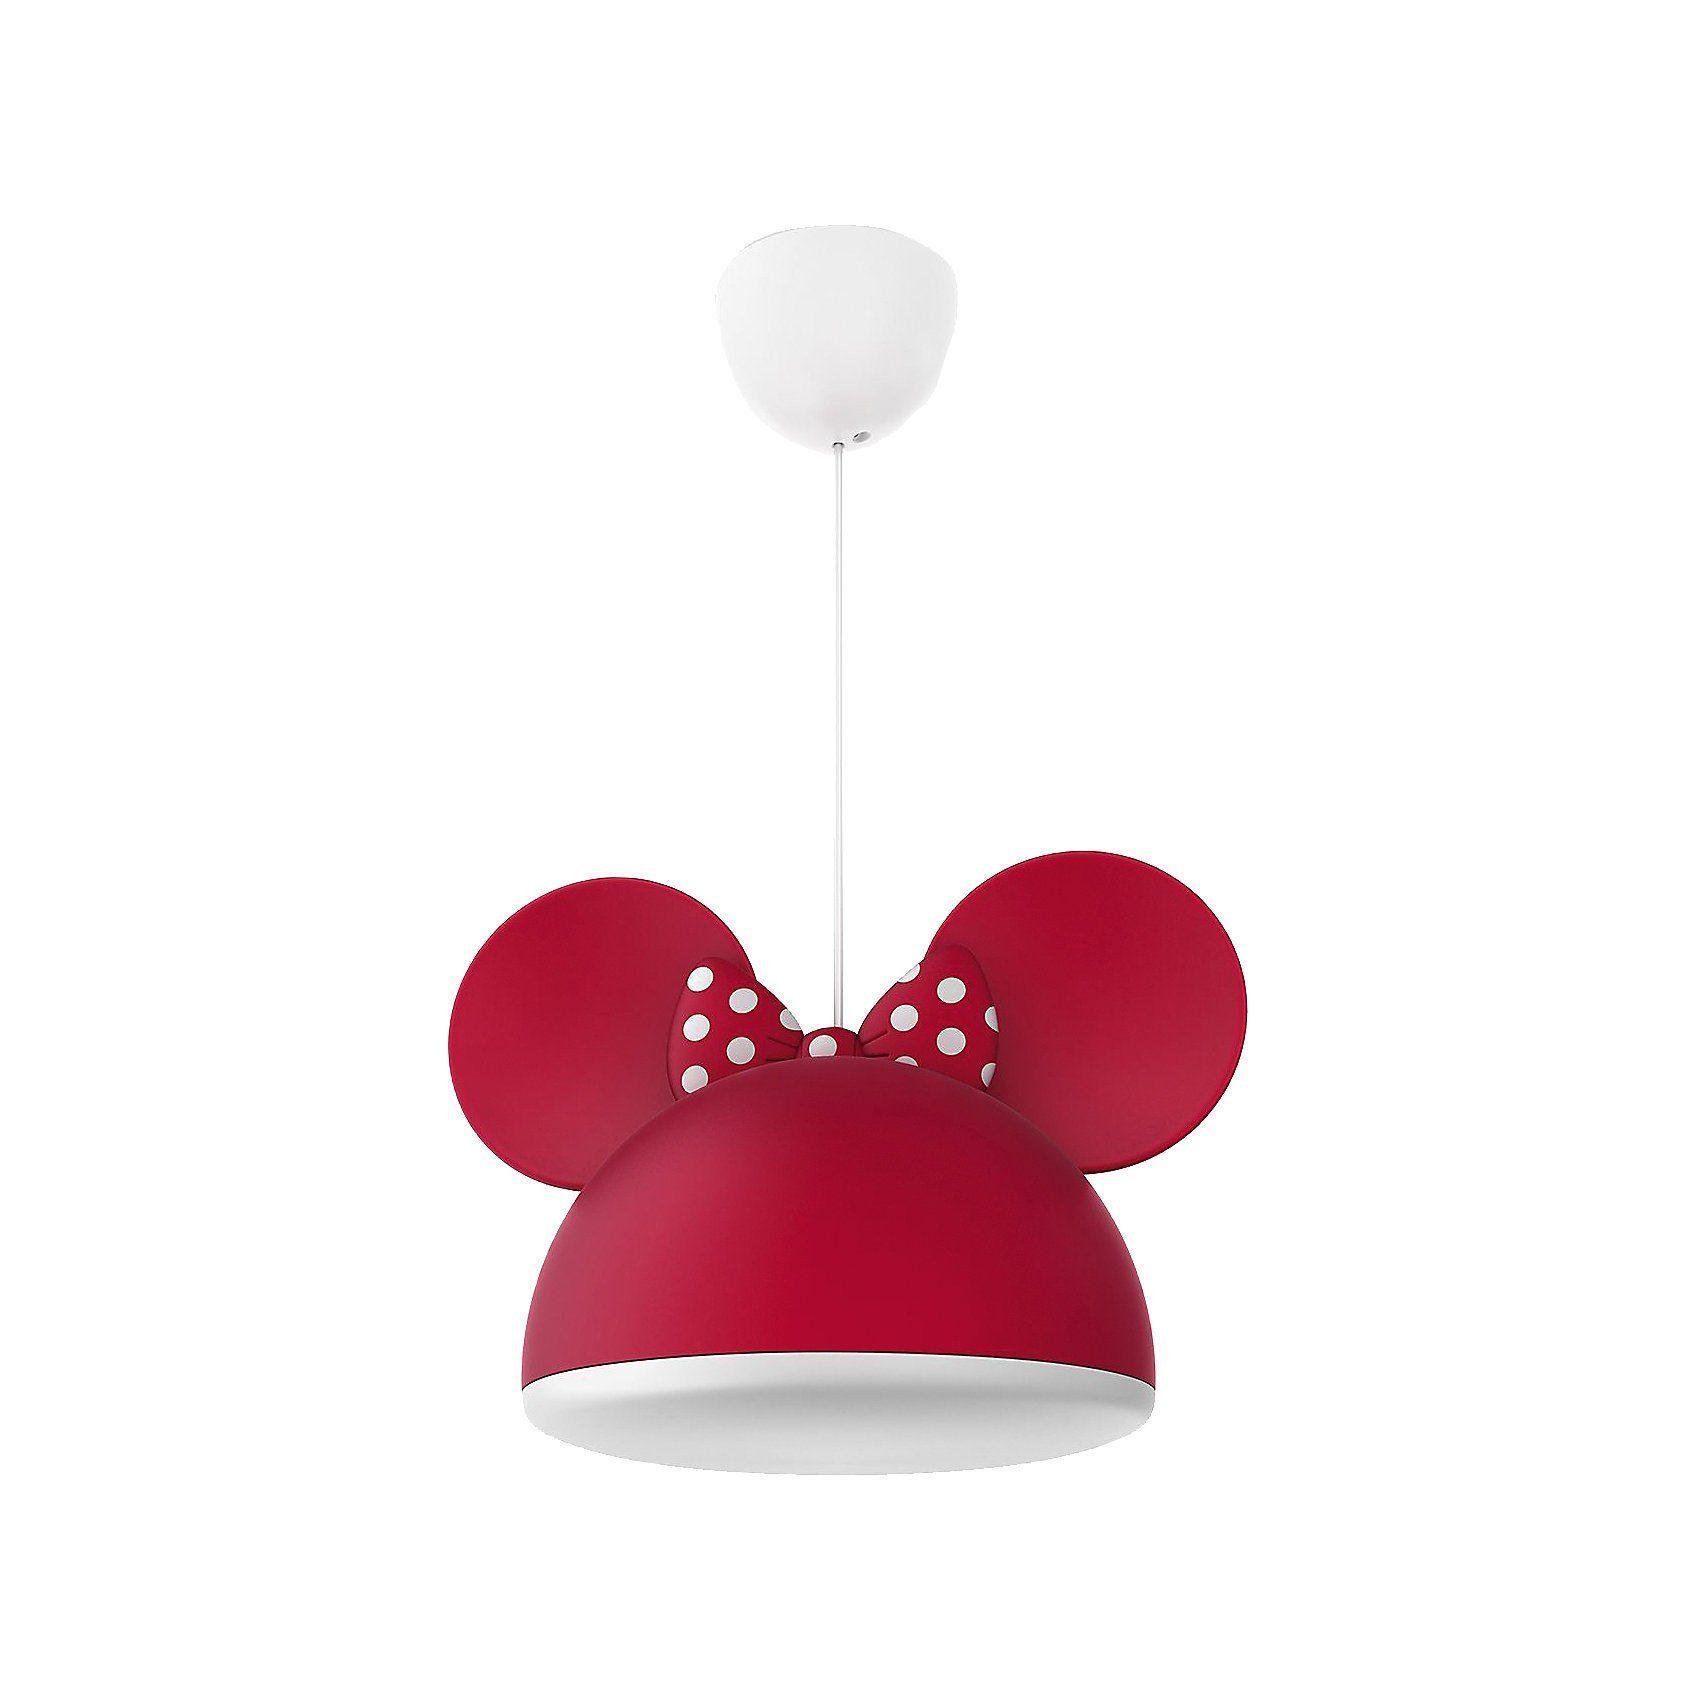 Philips Lighting Hängelampe, Minnie Mouse, rot